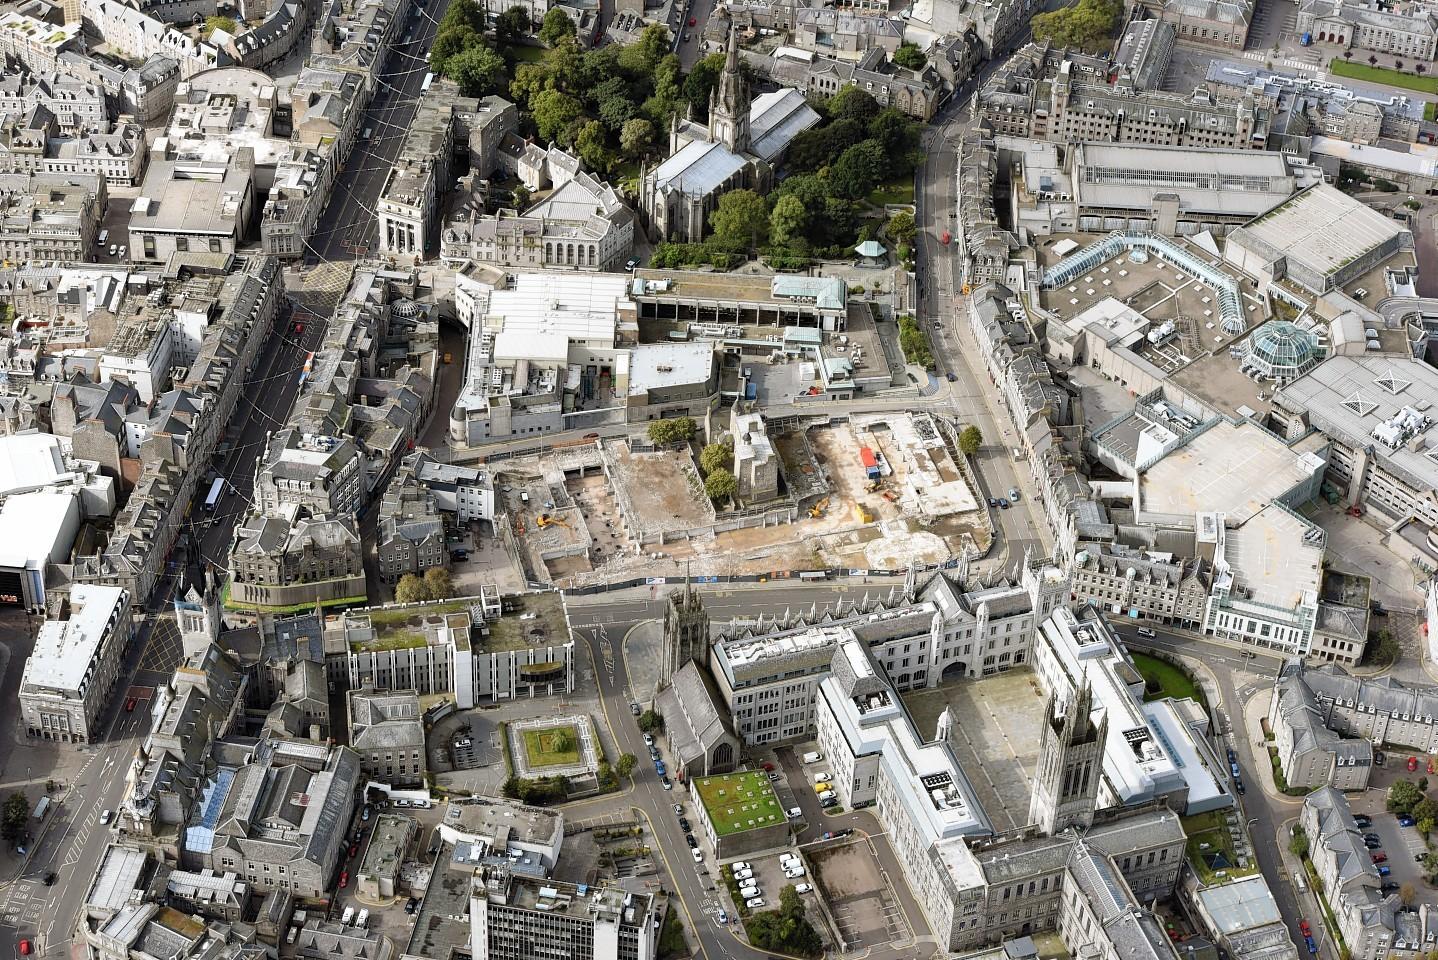 Marischal Square aerial view